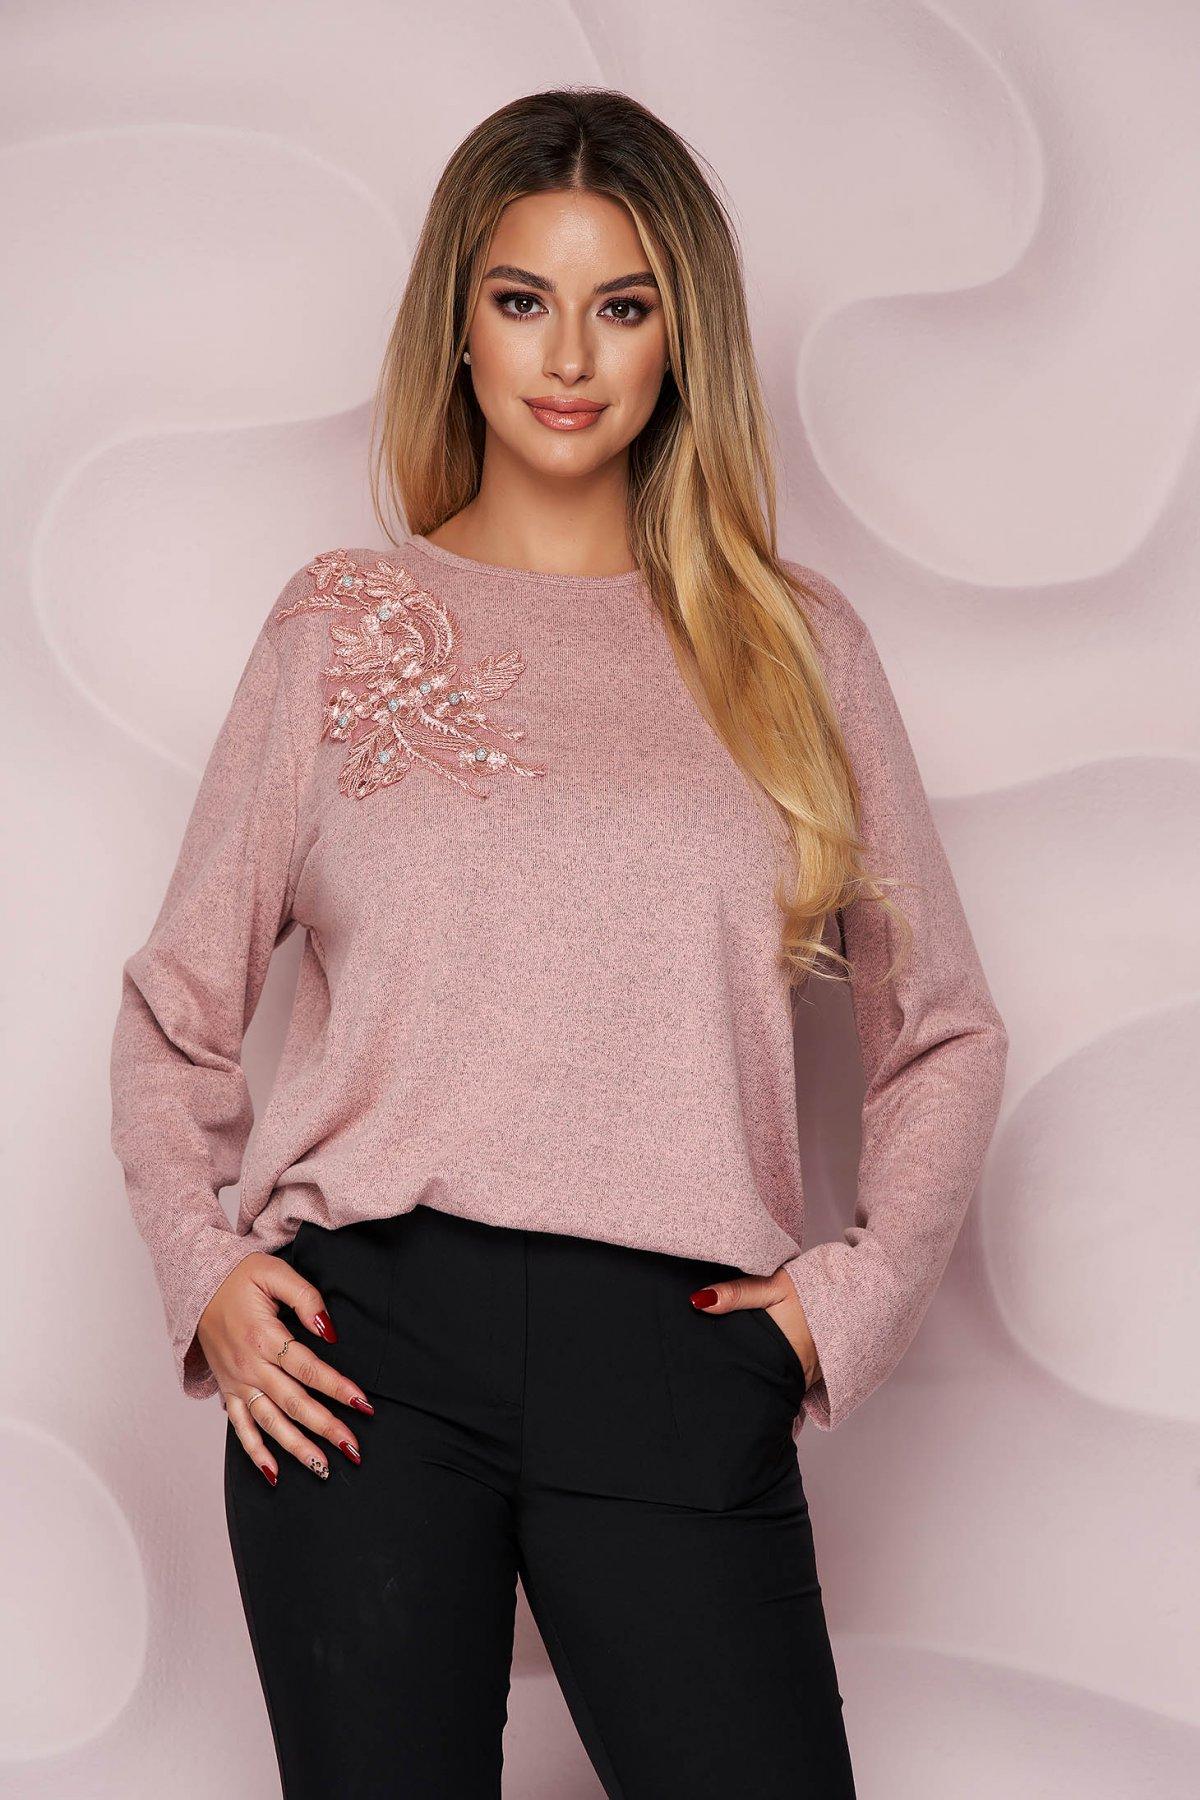 Bluza dama Lady Pandora roz office cu croi larg din material tricotat elastic si subtire si broderie florala